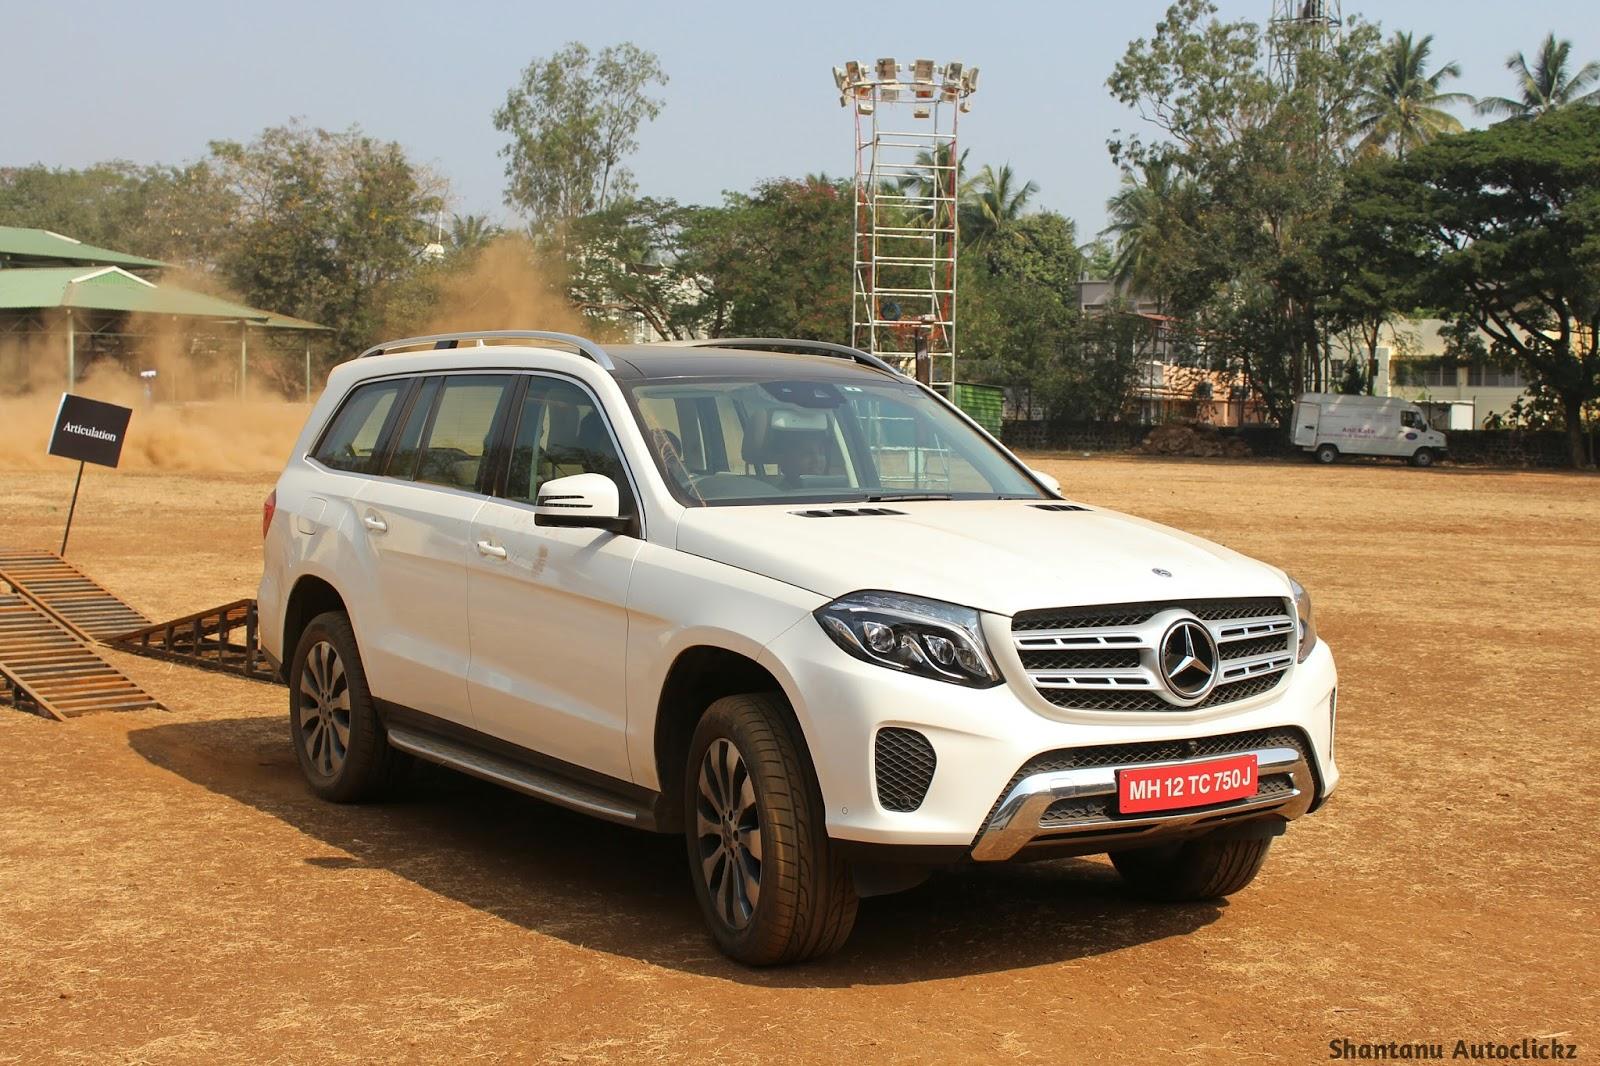 Mercedes gls 350d 2017 for Mercedes benz gls 350d price in india